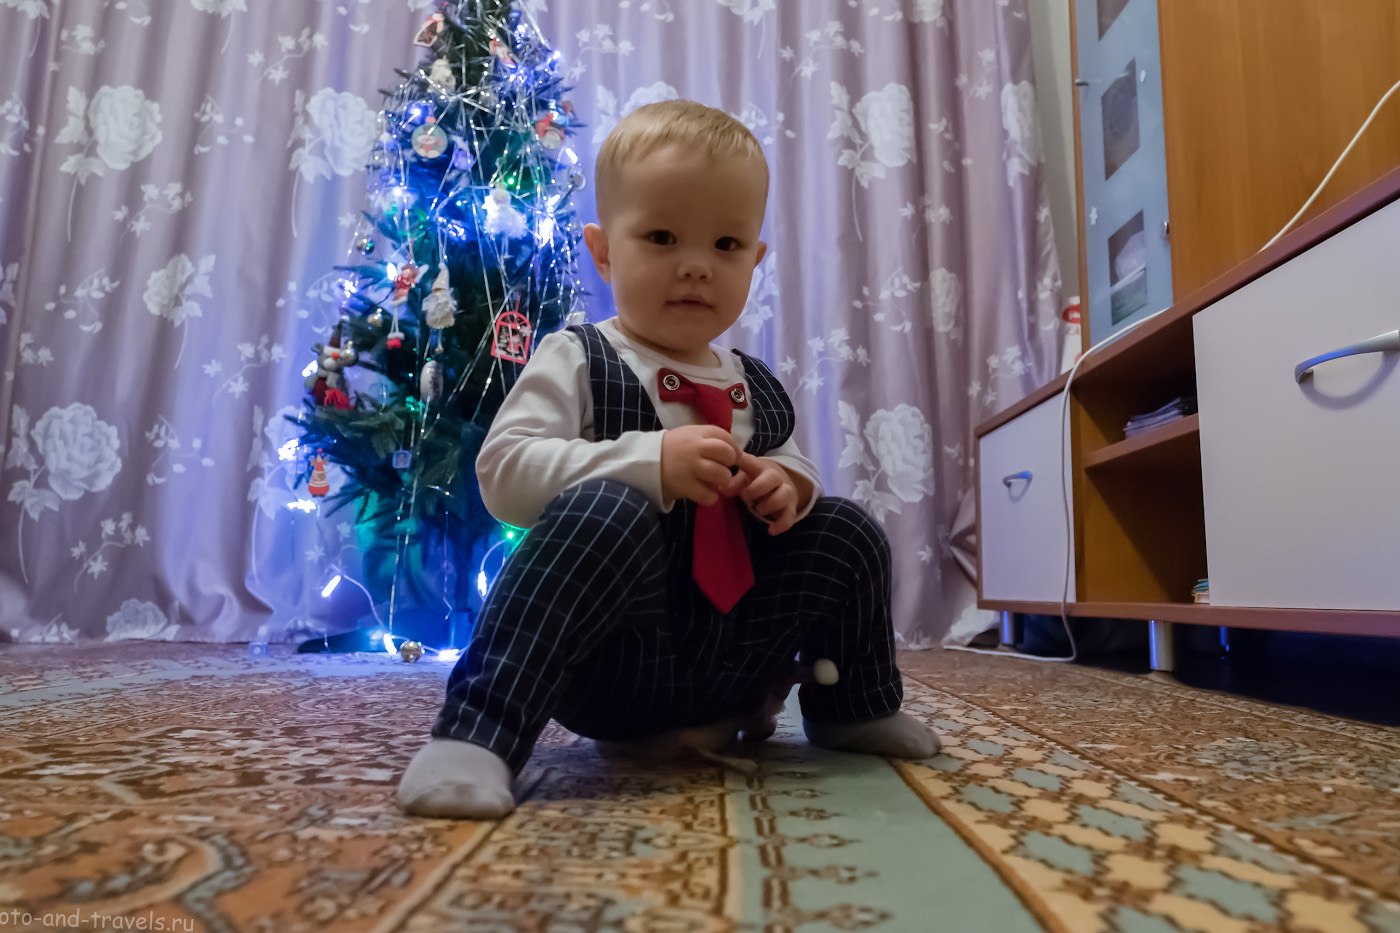 Фото 3. Трудности при съемке детского портрета на новогоднем утреннике при использовании освещения от ламп постоянного света в помещении. Снято на Fujifilm X-T10 с объективом Fujinon 16-55mm f/2.8 (в редакторе увеличил экспозицию на +1,5 EV). Настройки: 1/60, 3.2, 3200, 16.